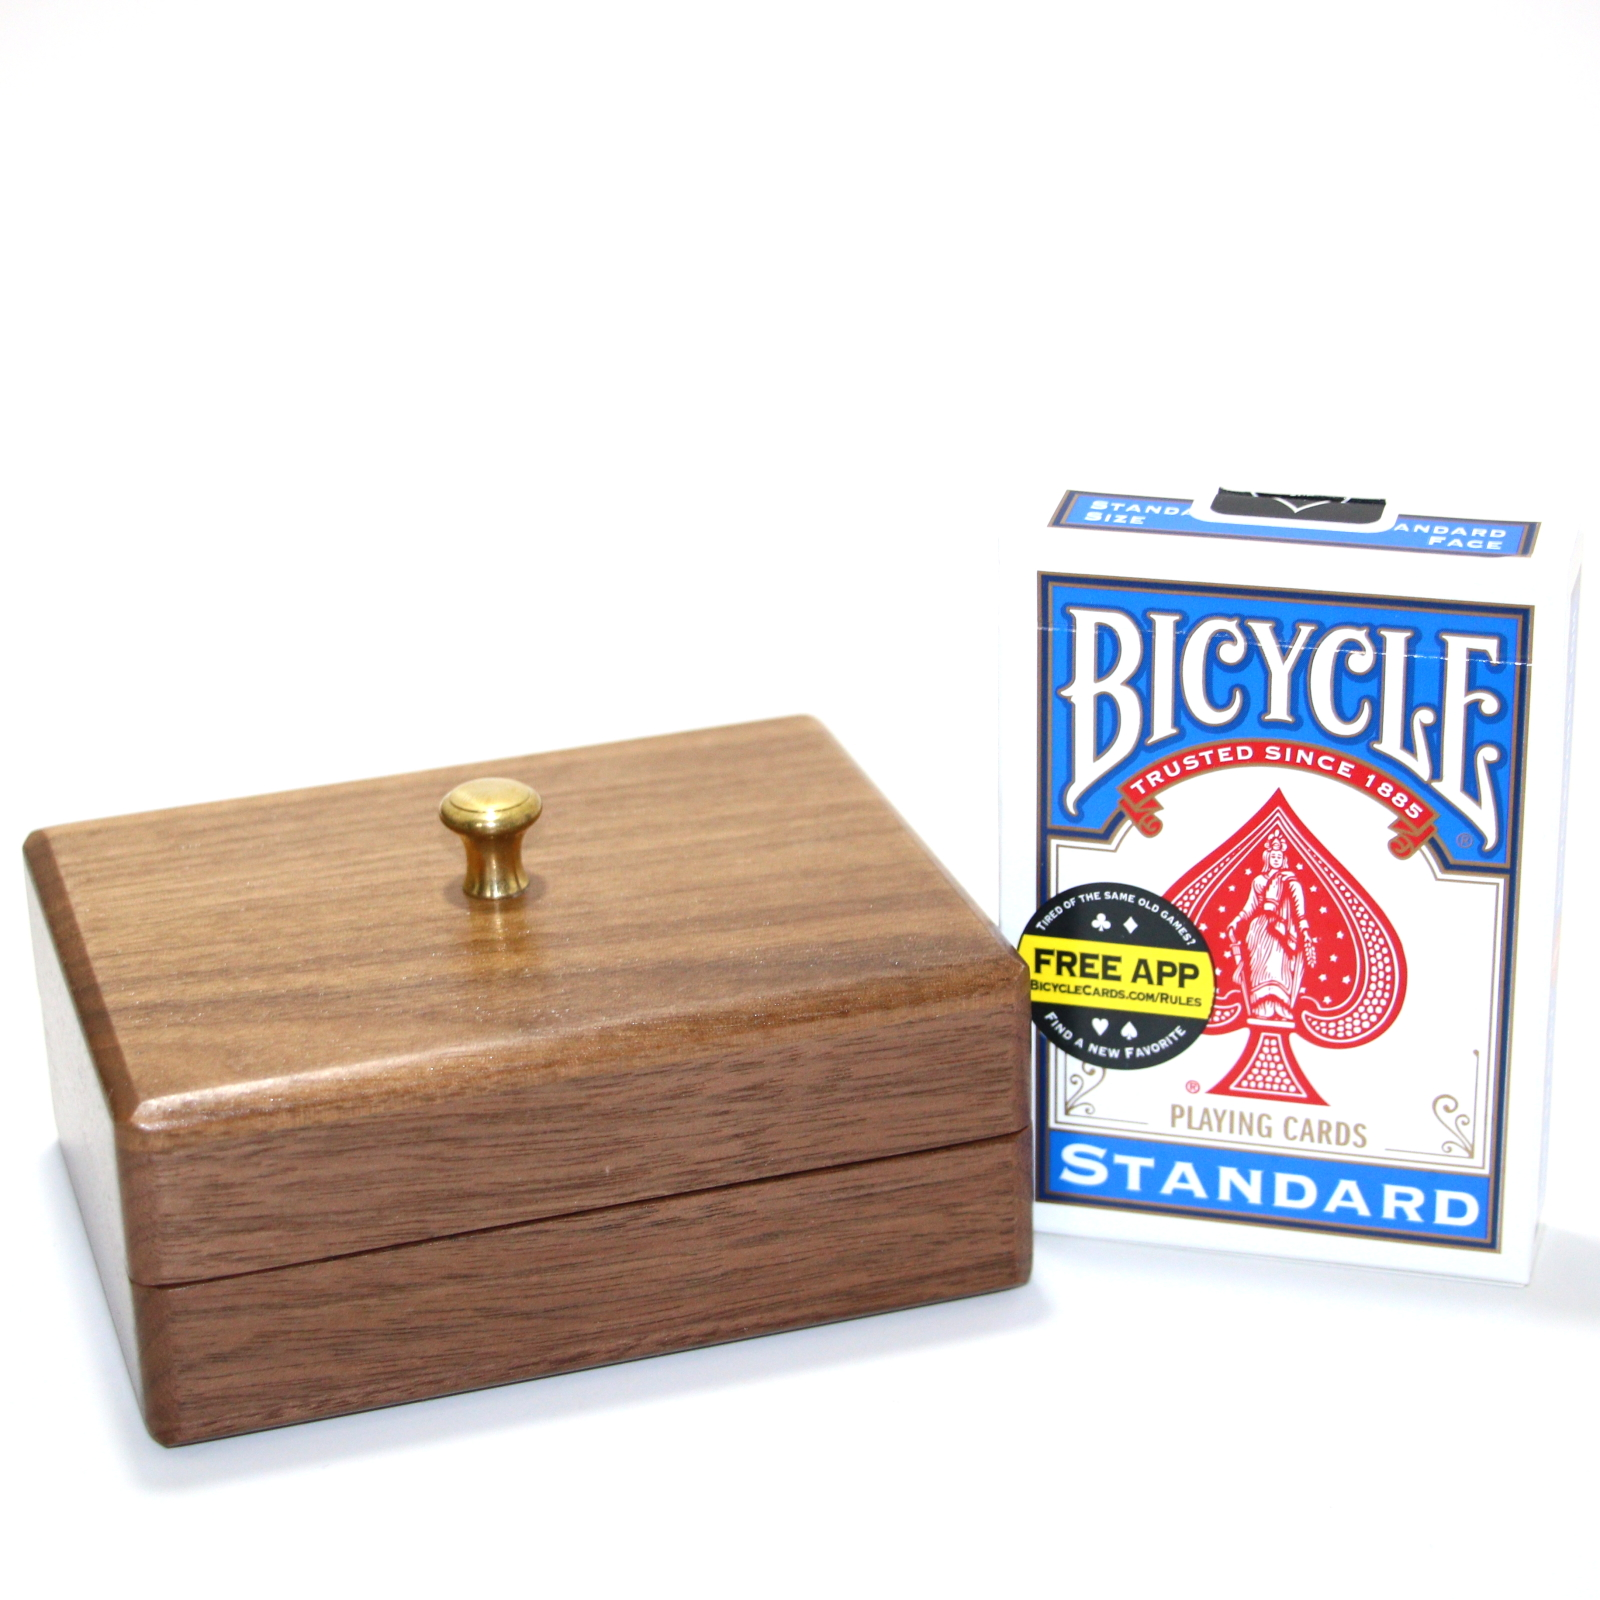 Locking Card Box by Viking Mfg.